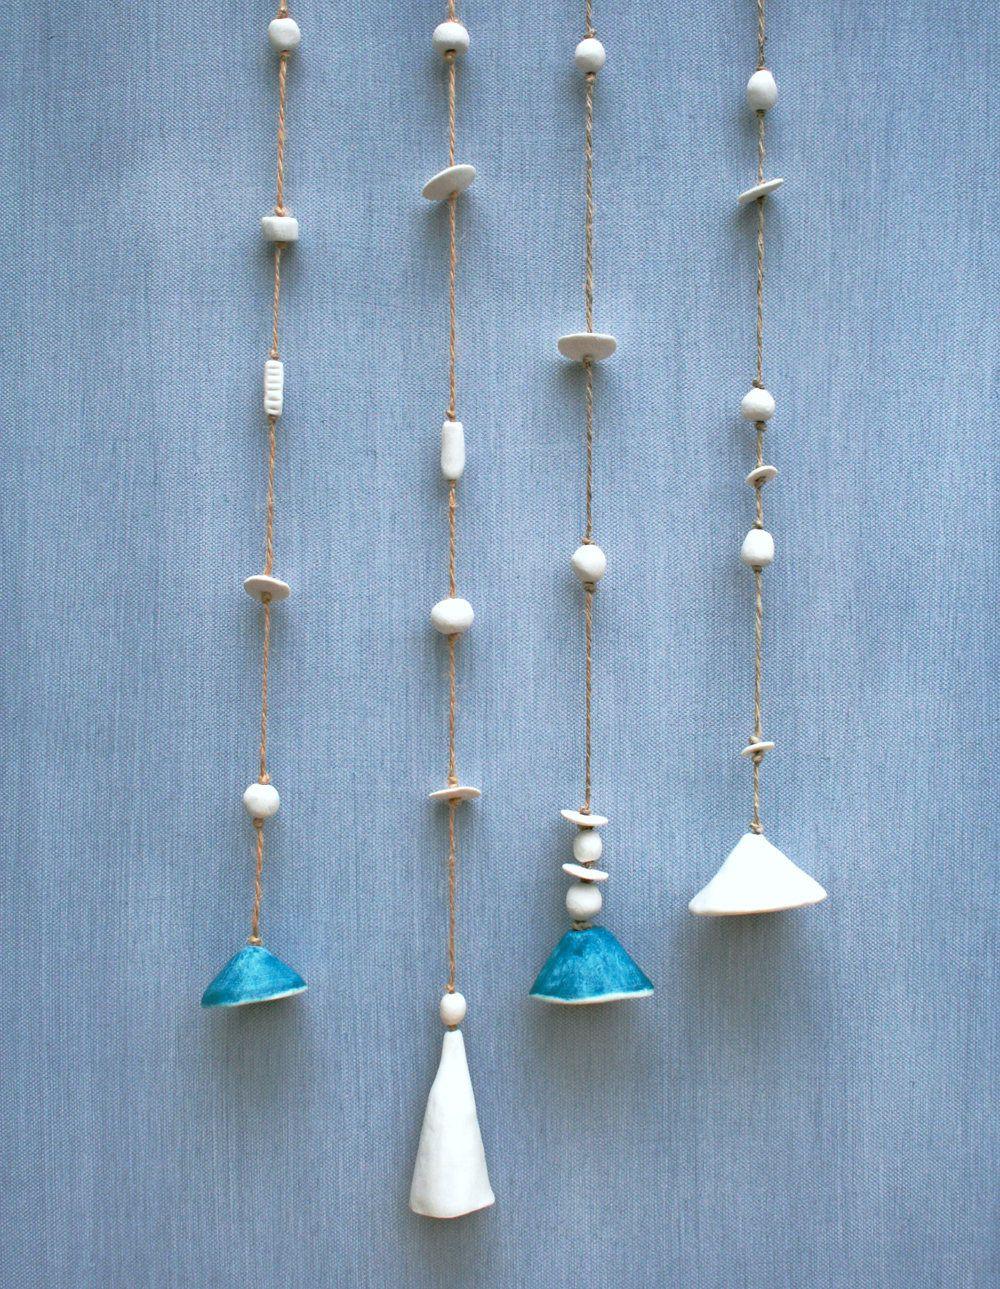 Artisan Ceramic Bells Decorative Hanging Bells Blue And White Porcelain Wall Hanging Garden Ornament Modern Home Dec Ceramic Bell Hanging Bell Boho Decor